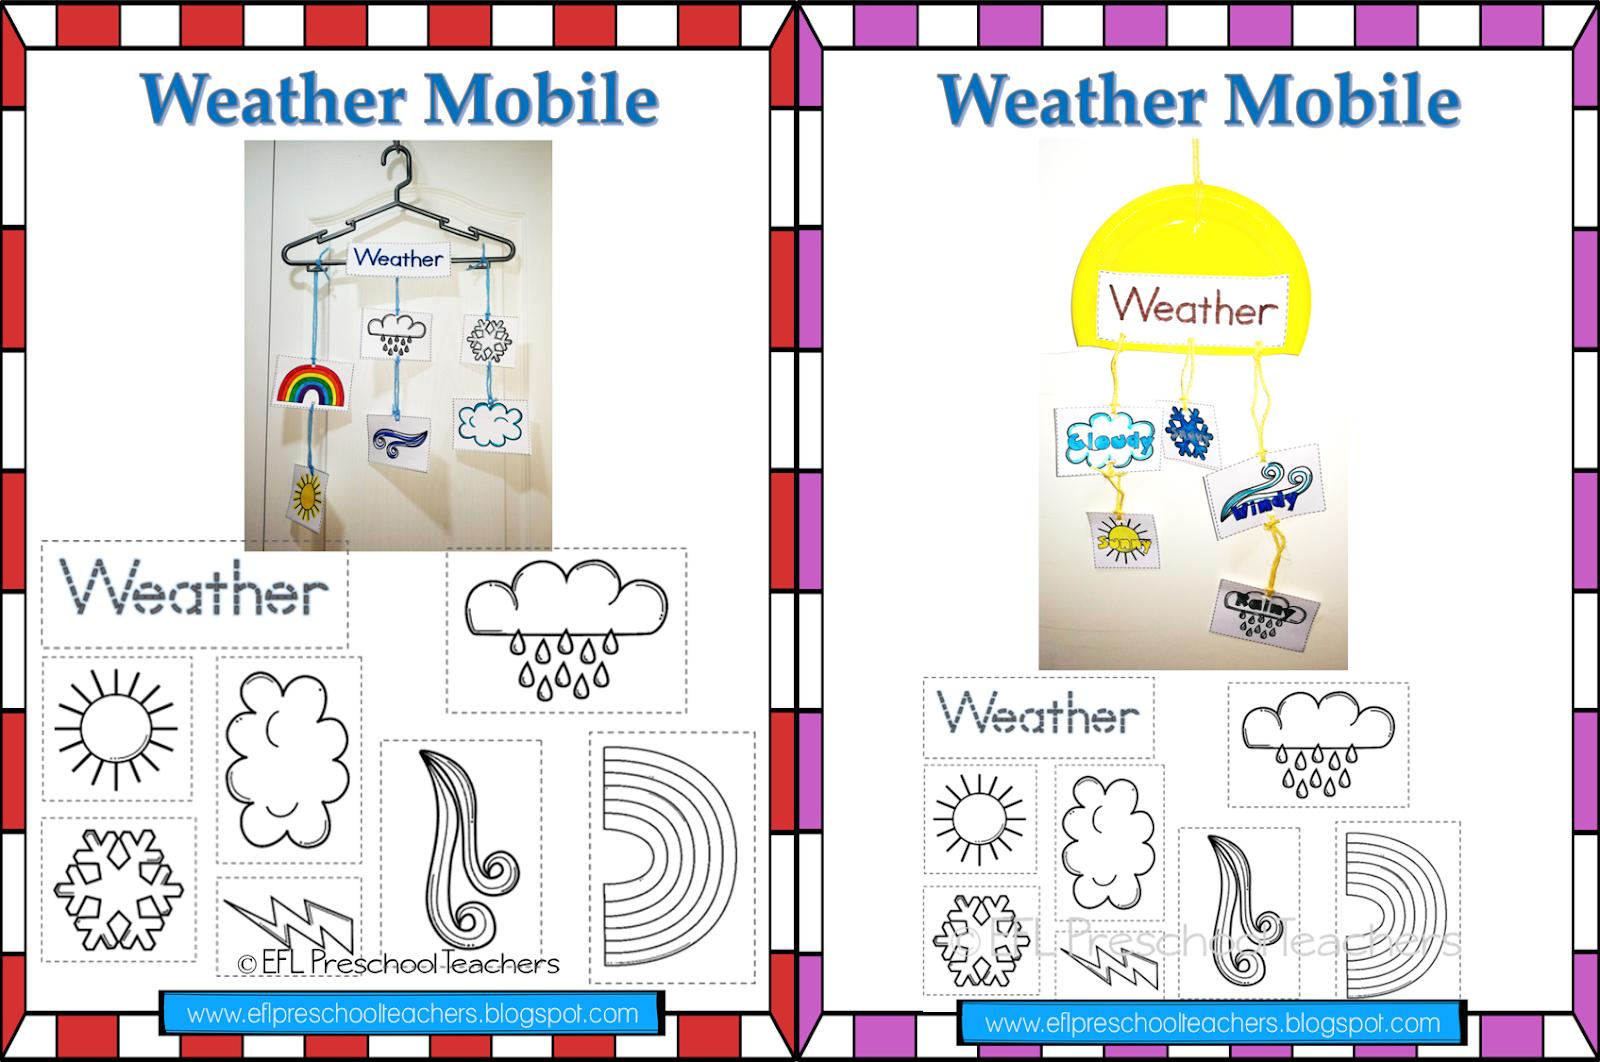 Esl Efl Preschool Teachers More Weather Resources For